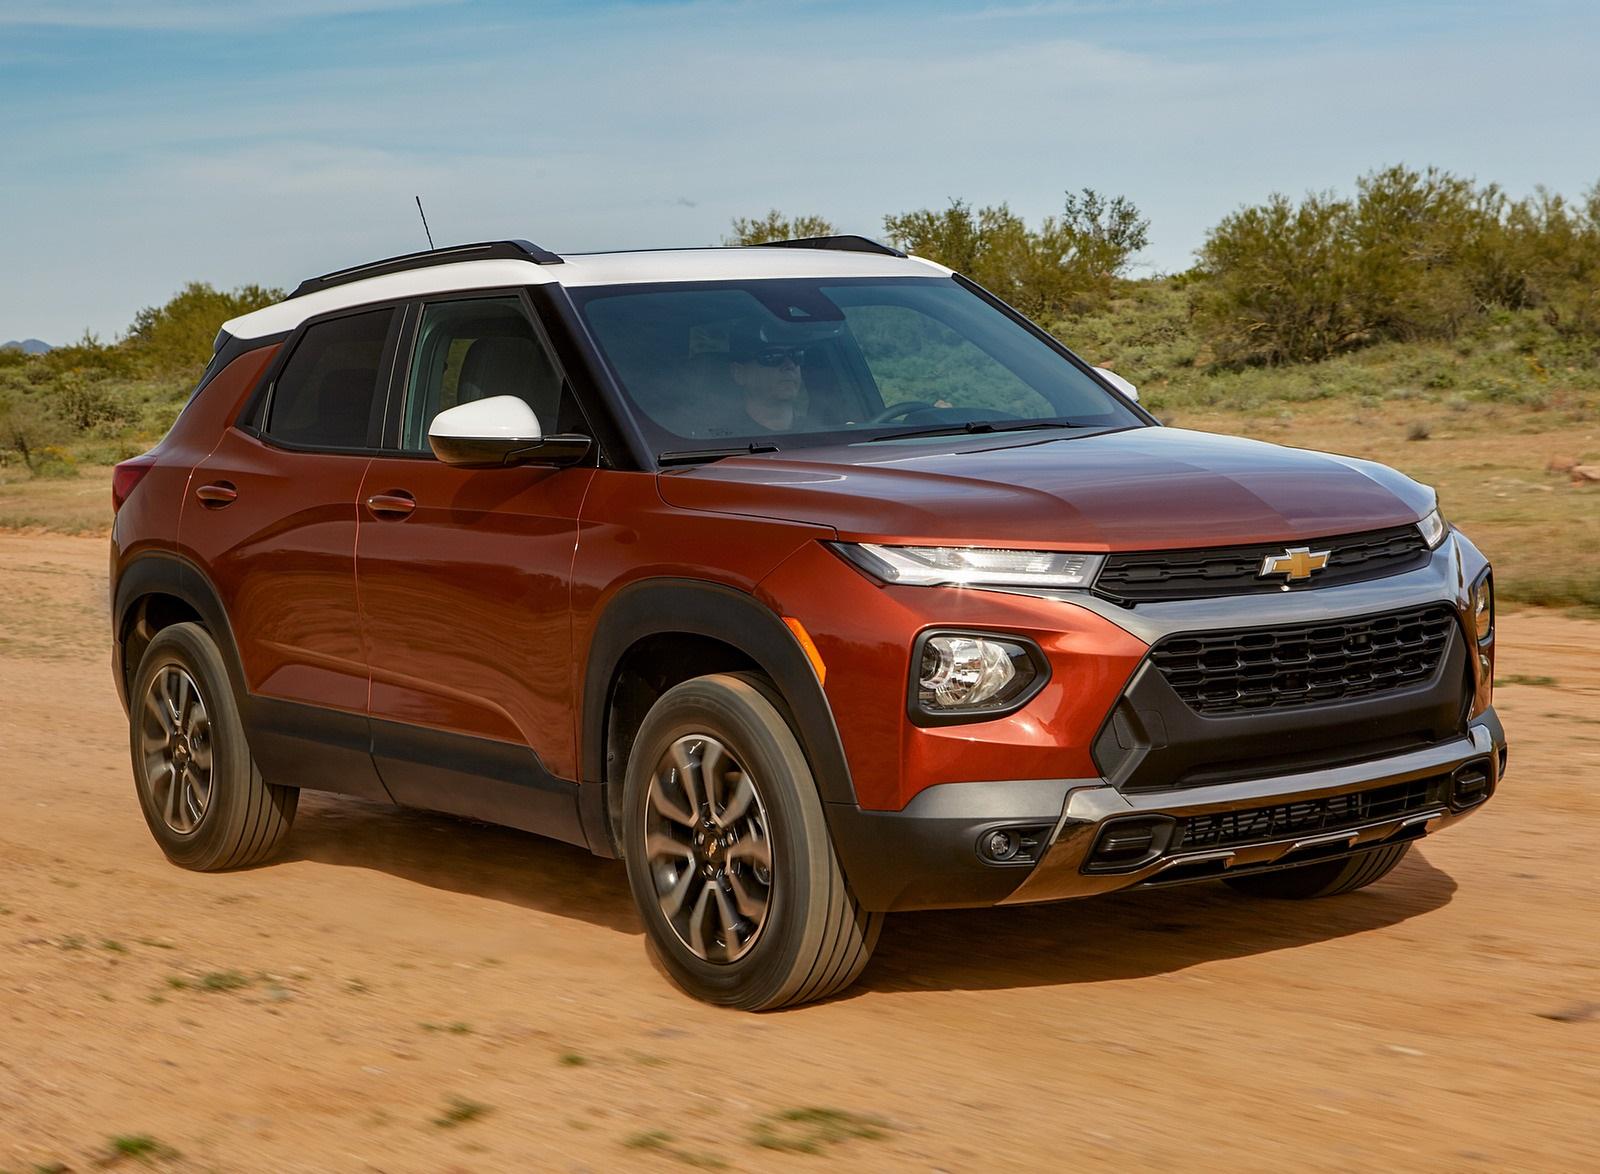 2021 Chevrolet Trailblazer ACTIV Front Three-Quarter Wallpapers (2)